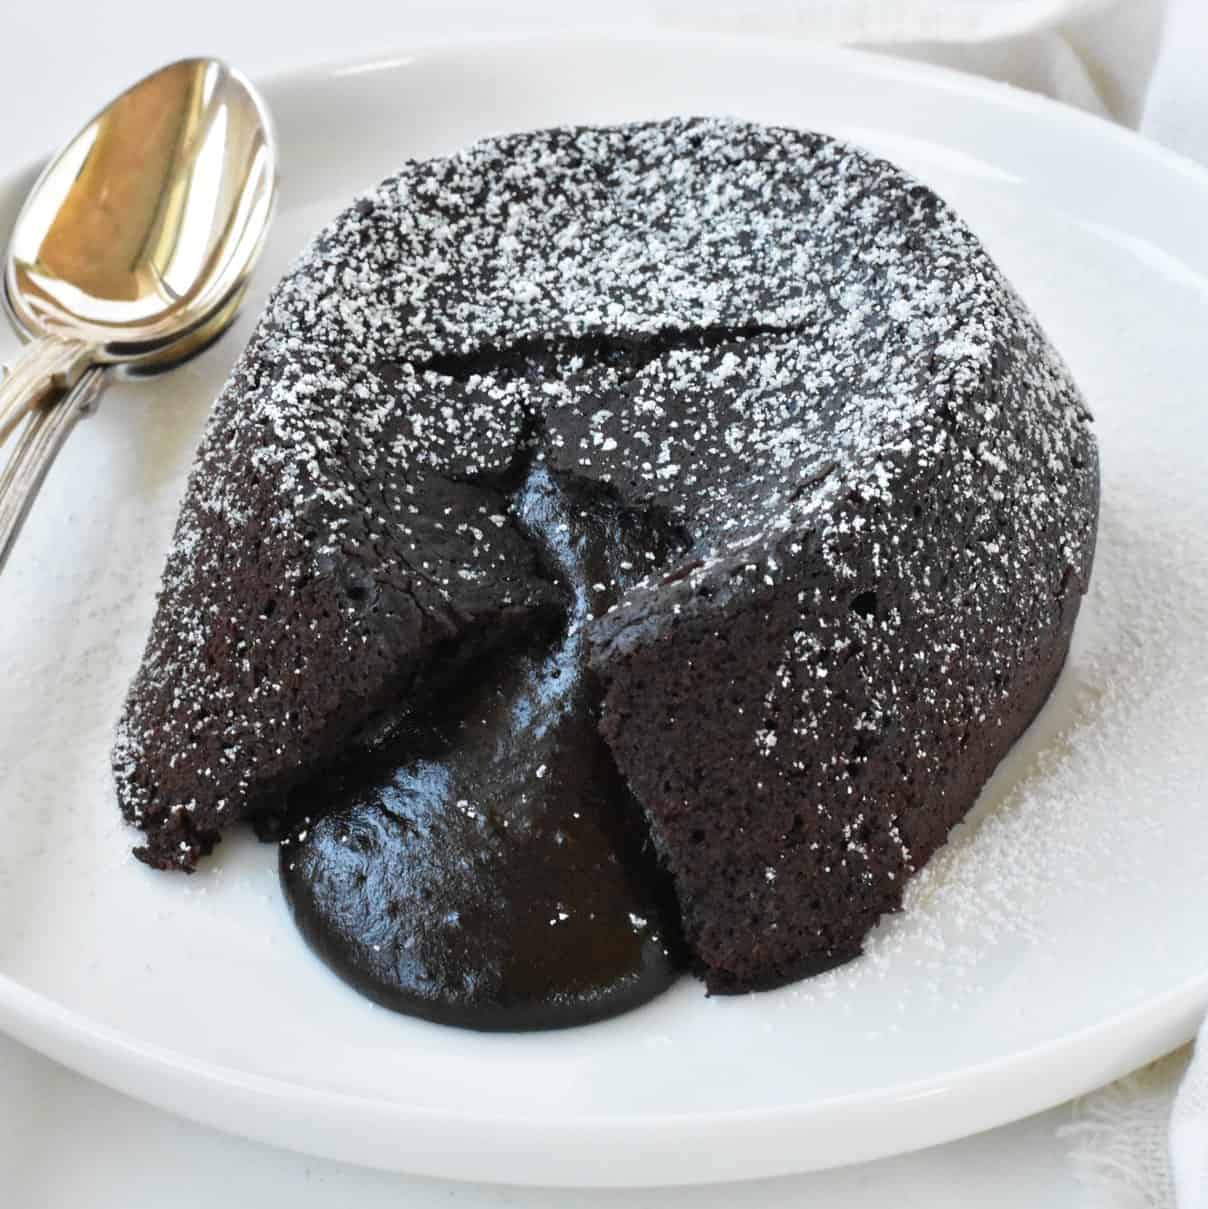 Molten lava cake on plate.